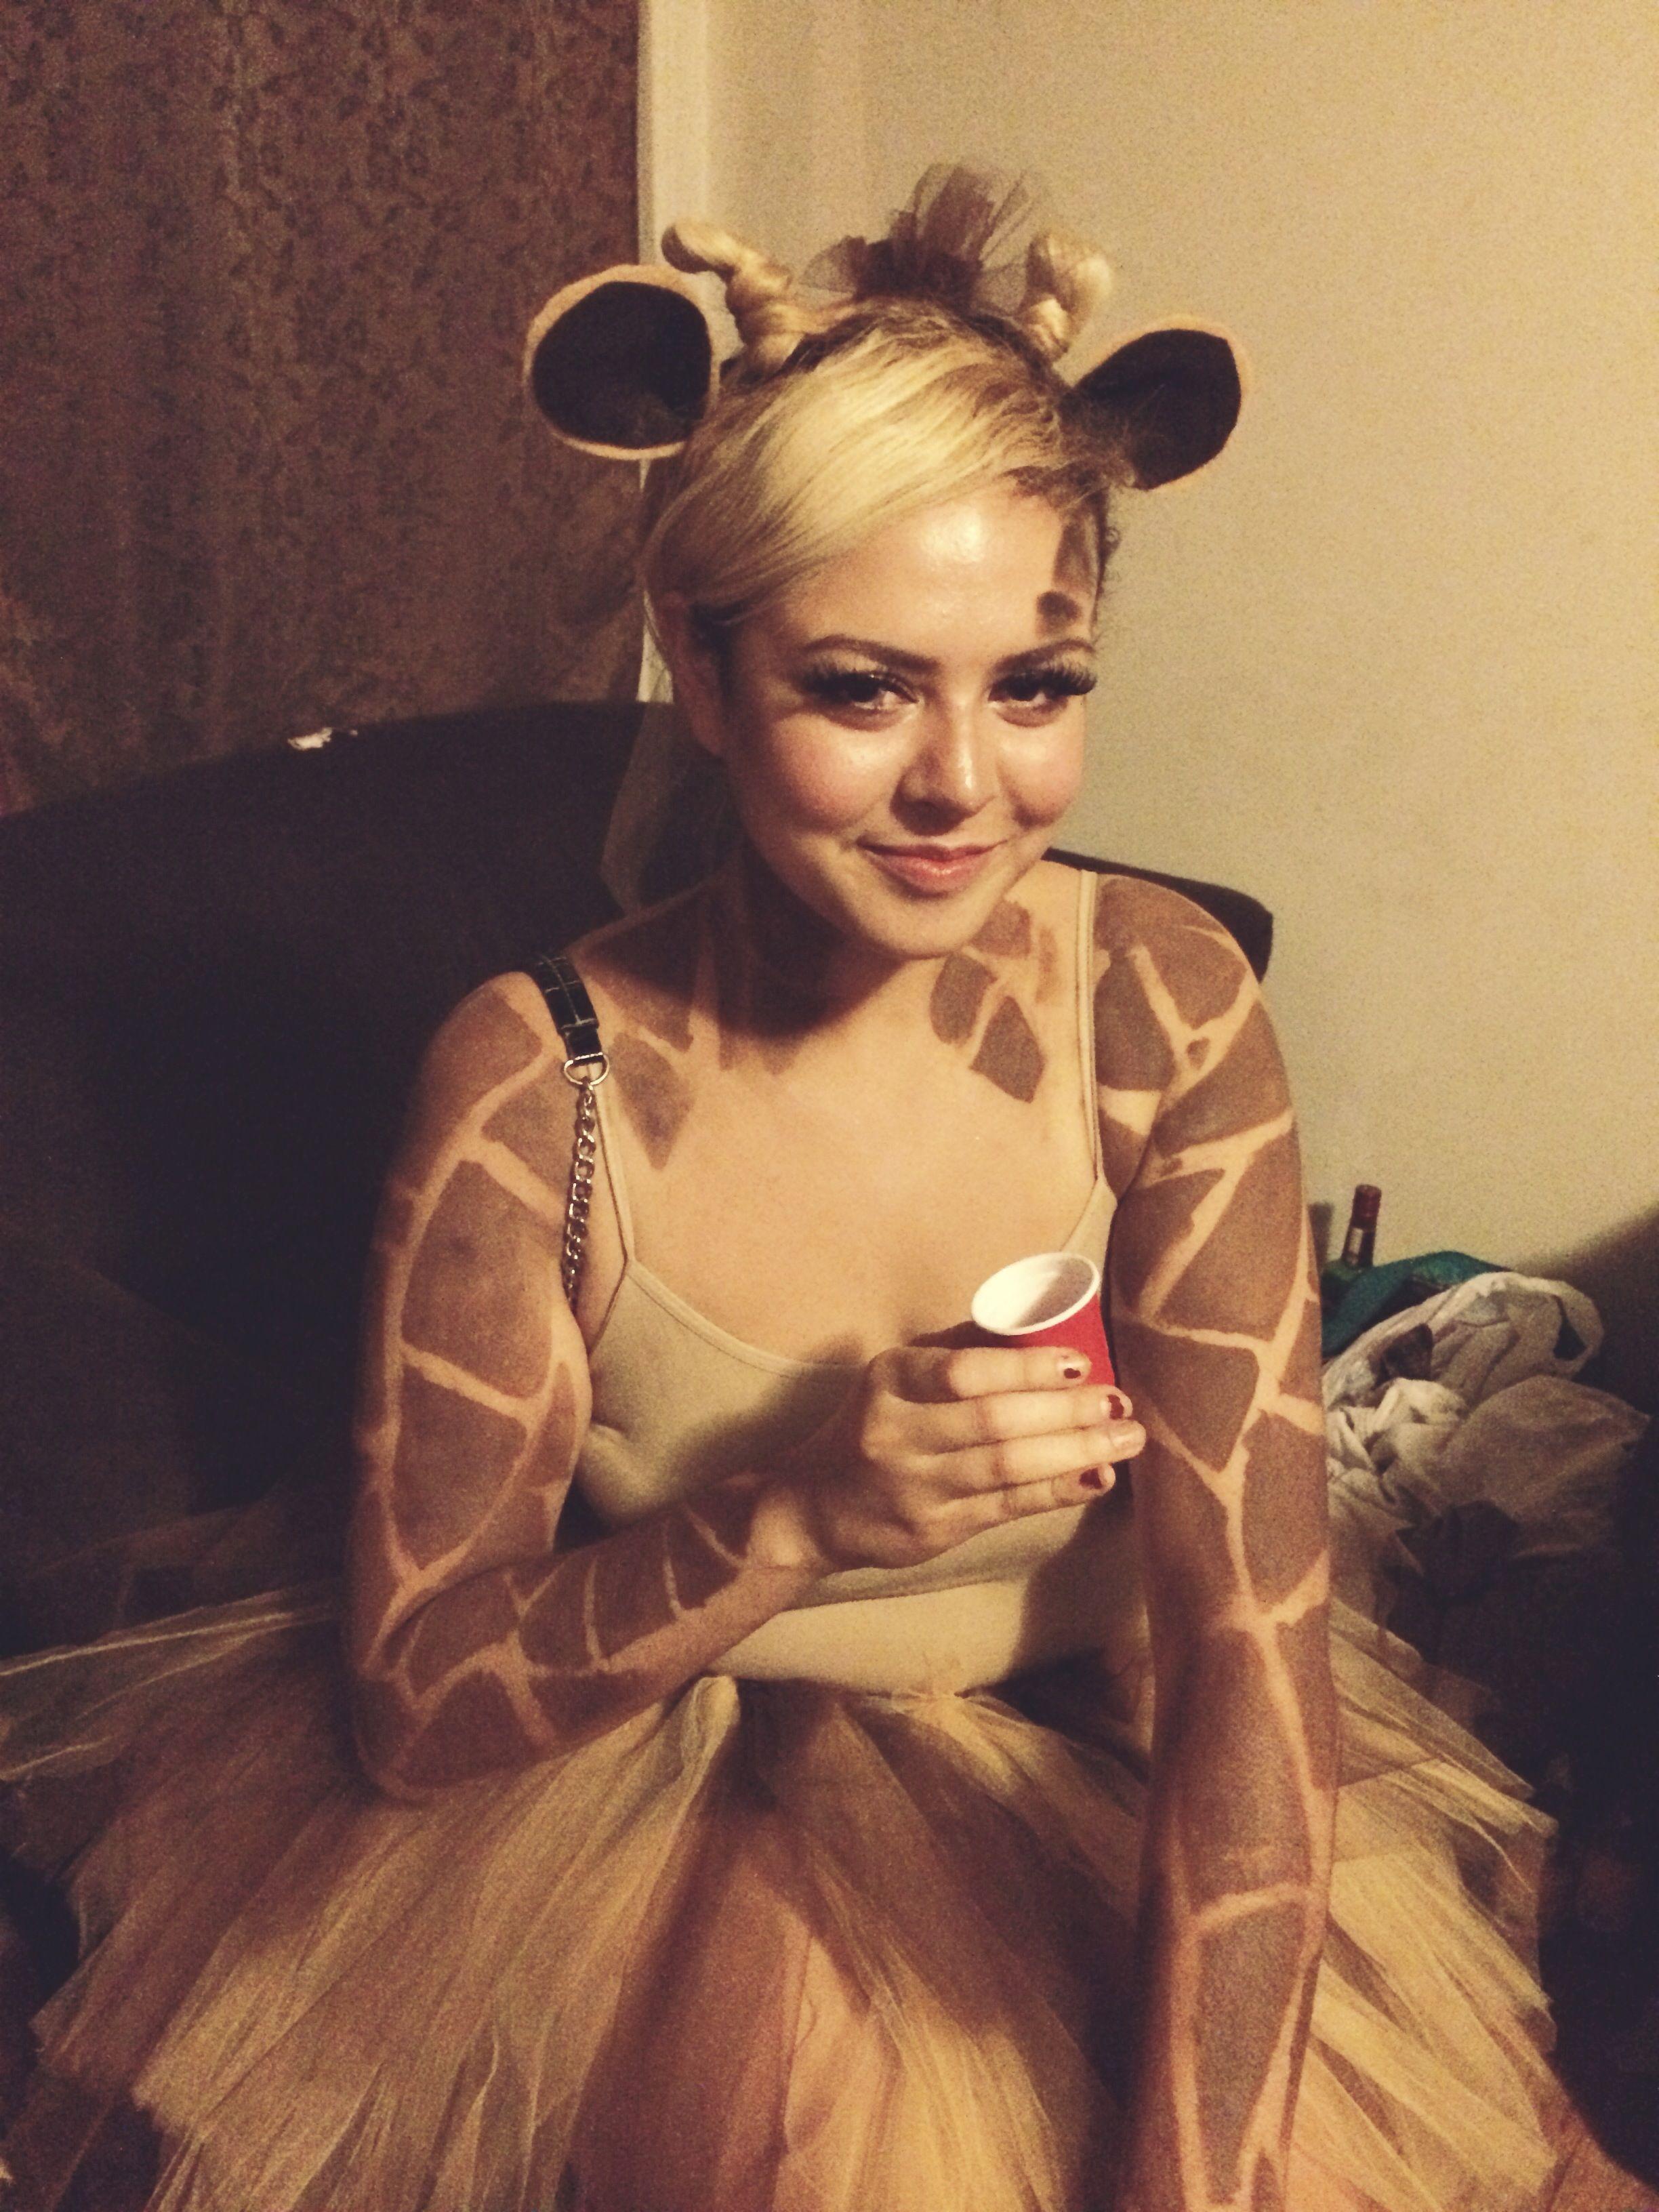 Diy giraffe costume ig jetaimekat halloween pinterest giraffe diy giraffe costume ig jetaimekat solutioingenieria Gallery